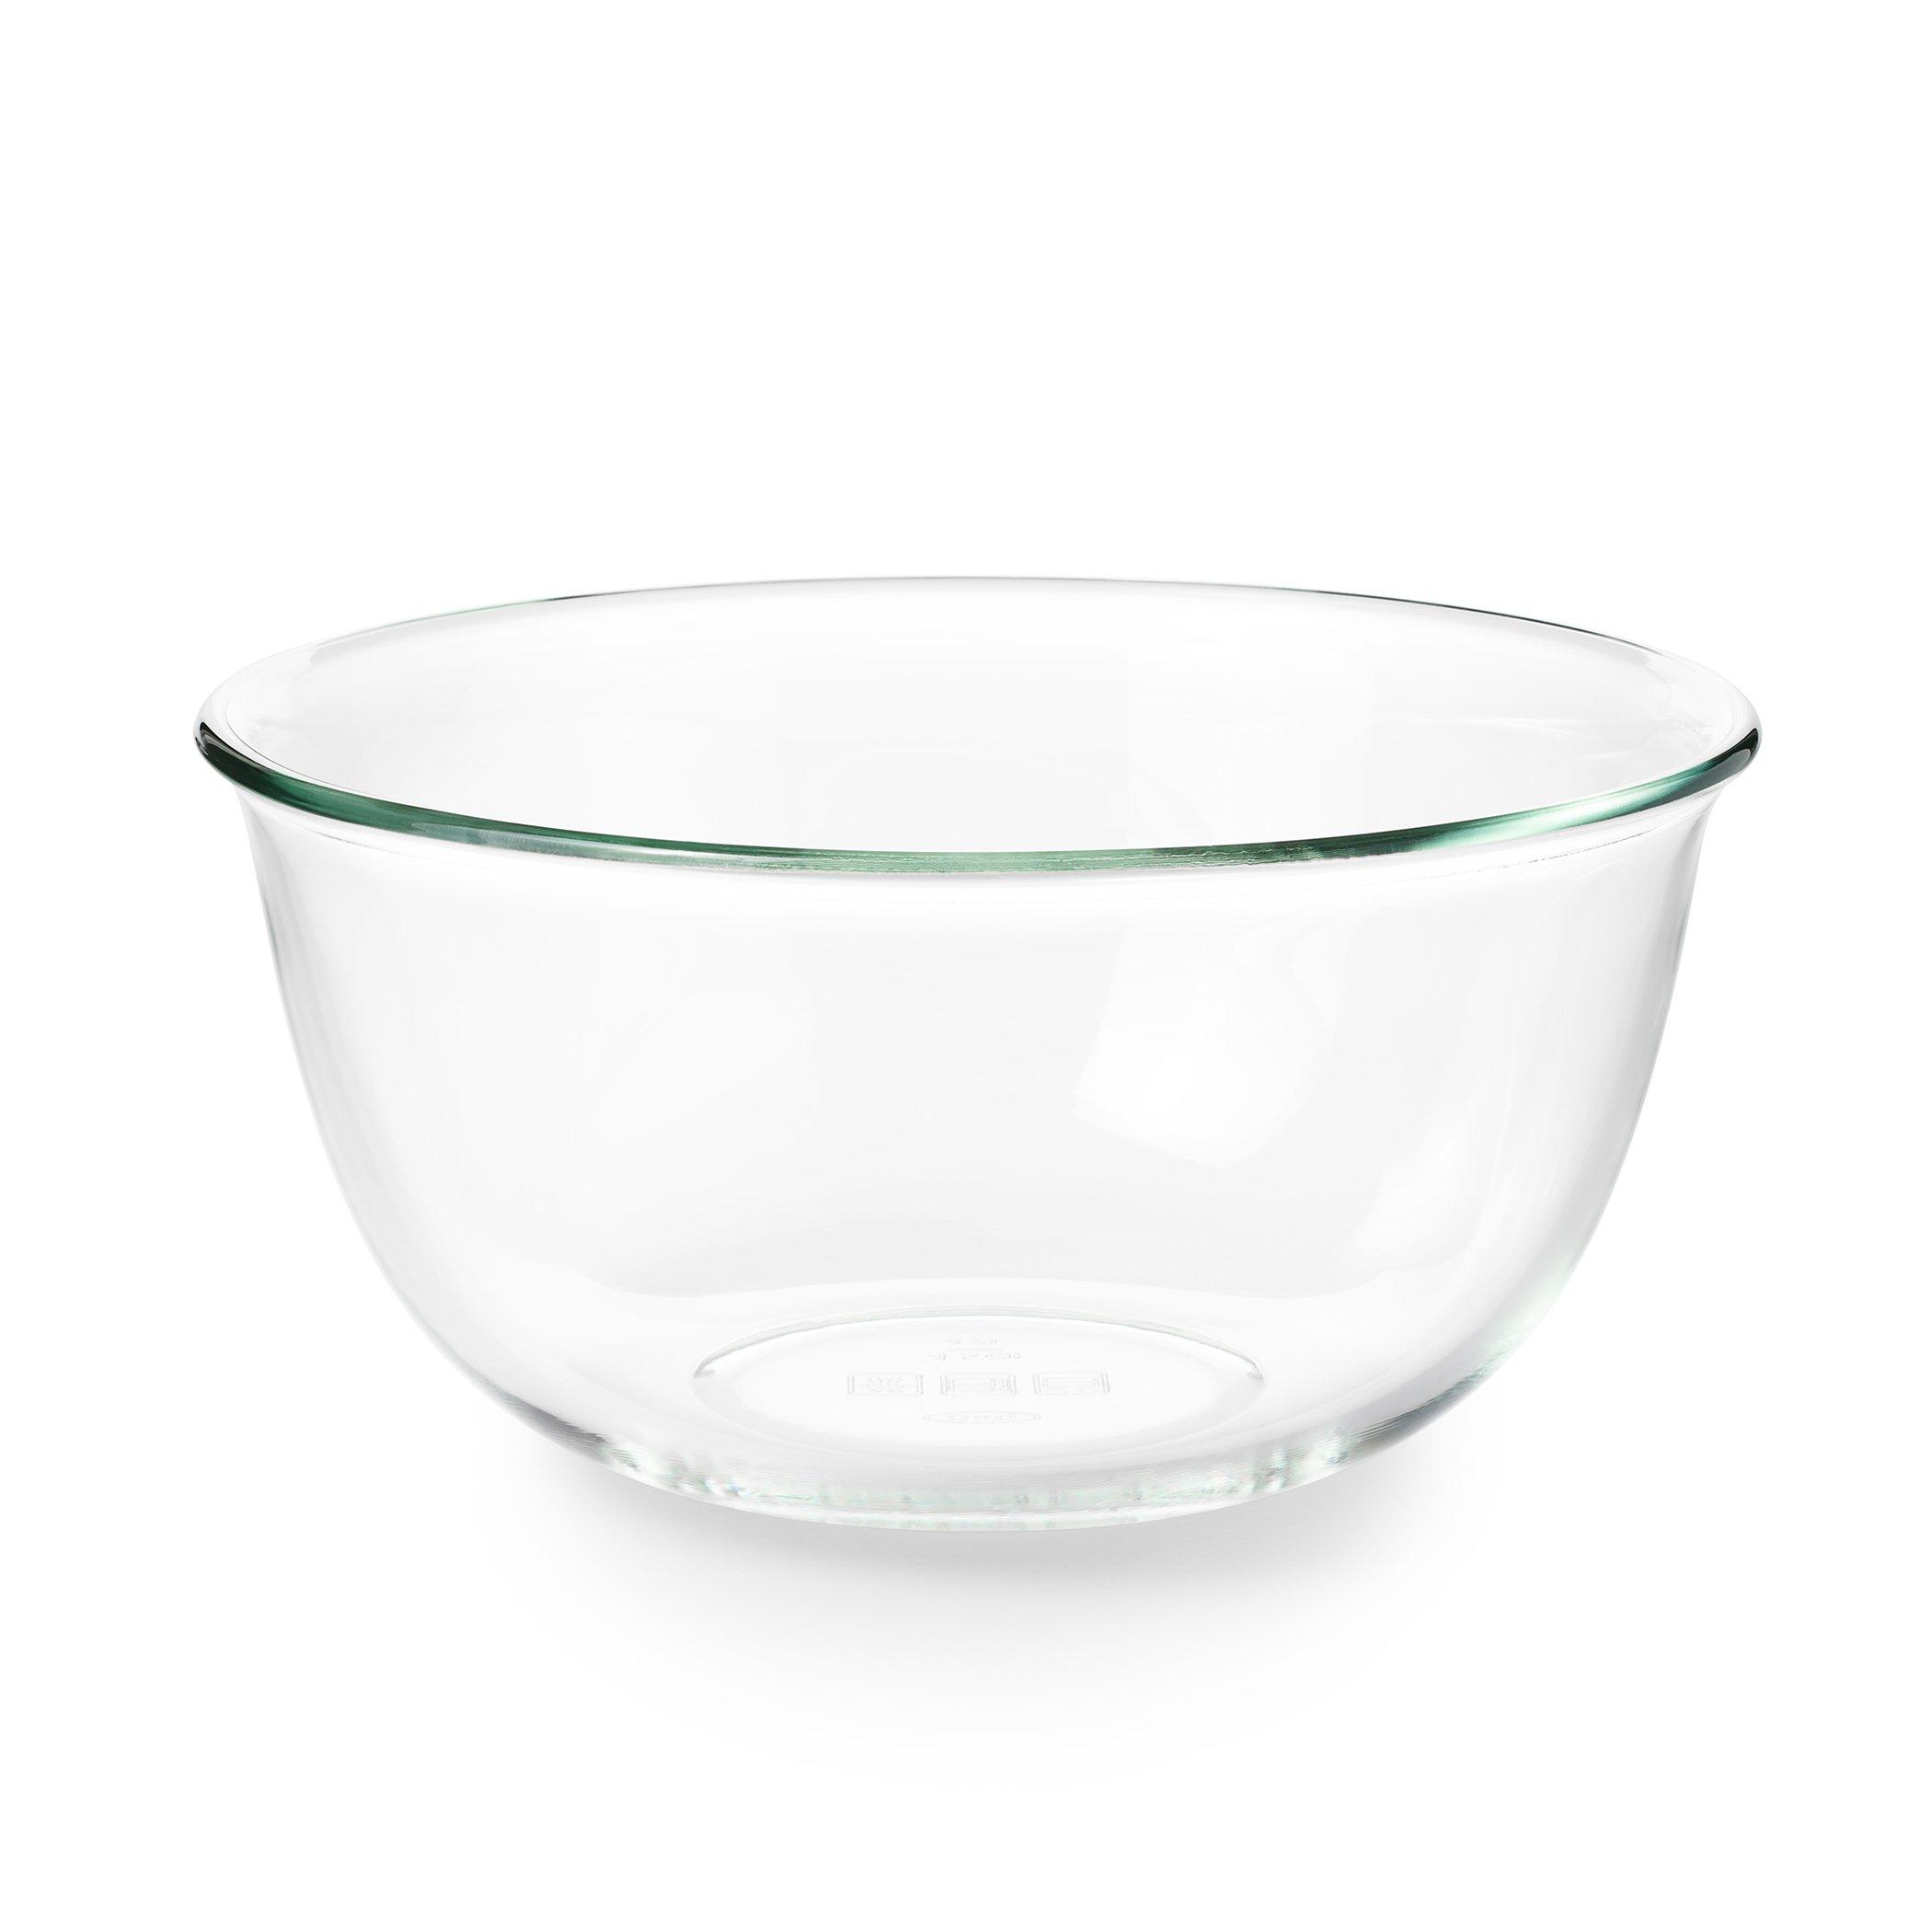 OXO Good Grips 4.5 Qt Glass Bowl